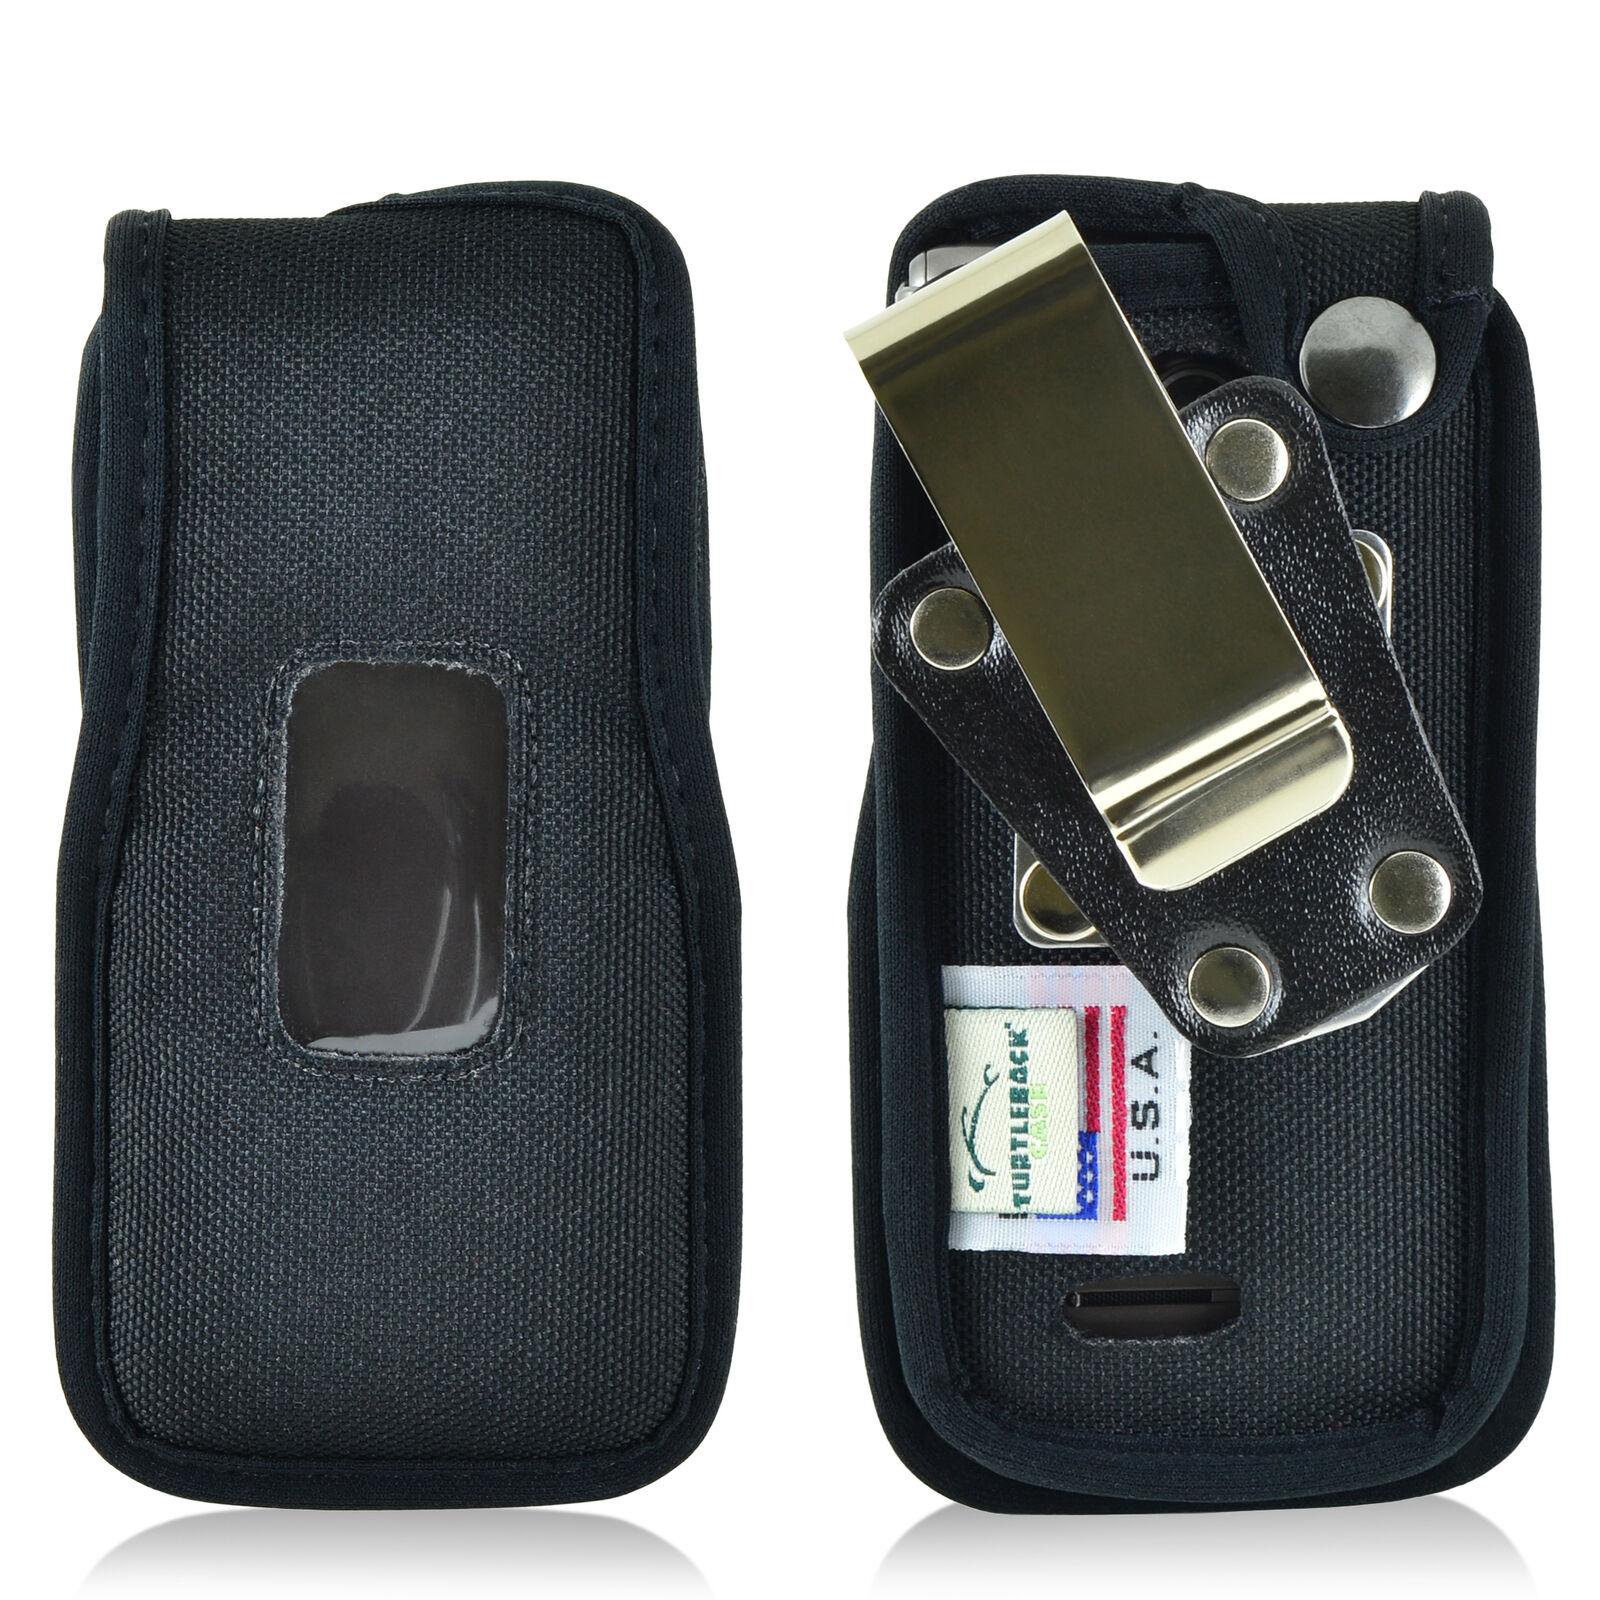 lg-exalt-2-ii-vn370-flip-phone-case-turtleback-black-nylon-removable-metal-clip